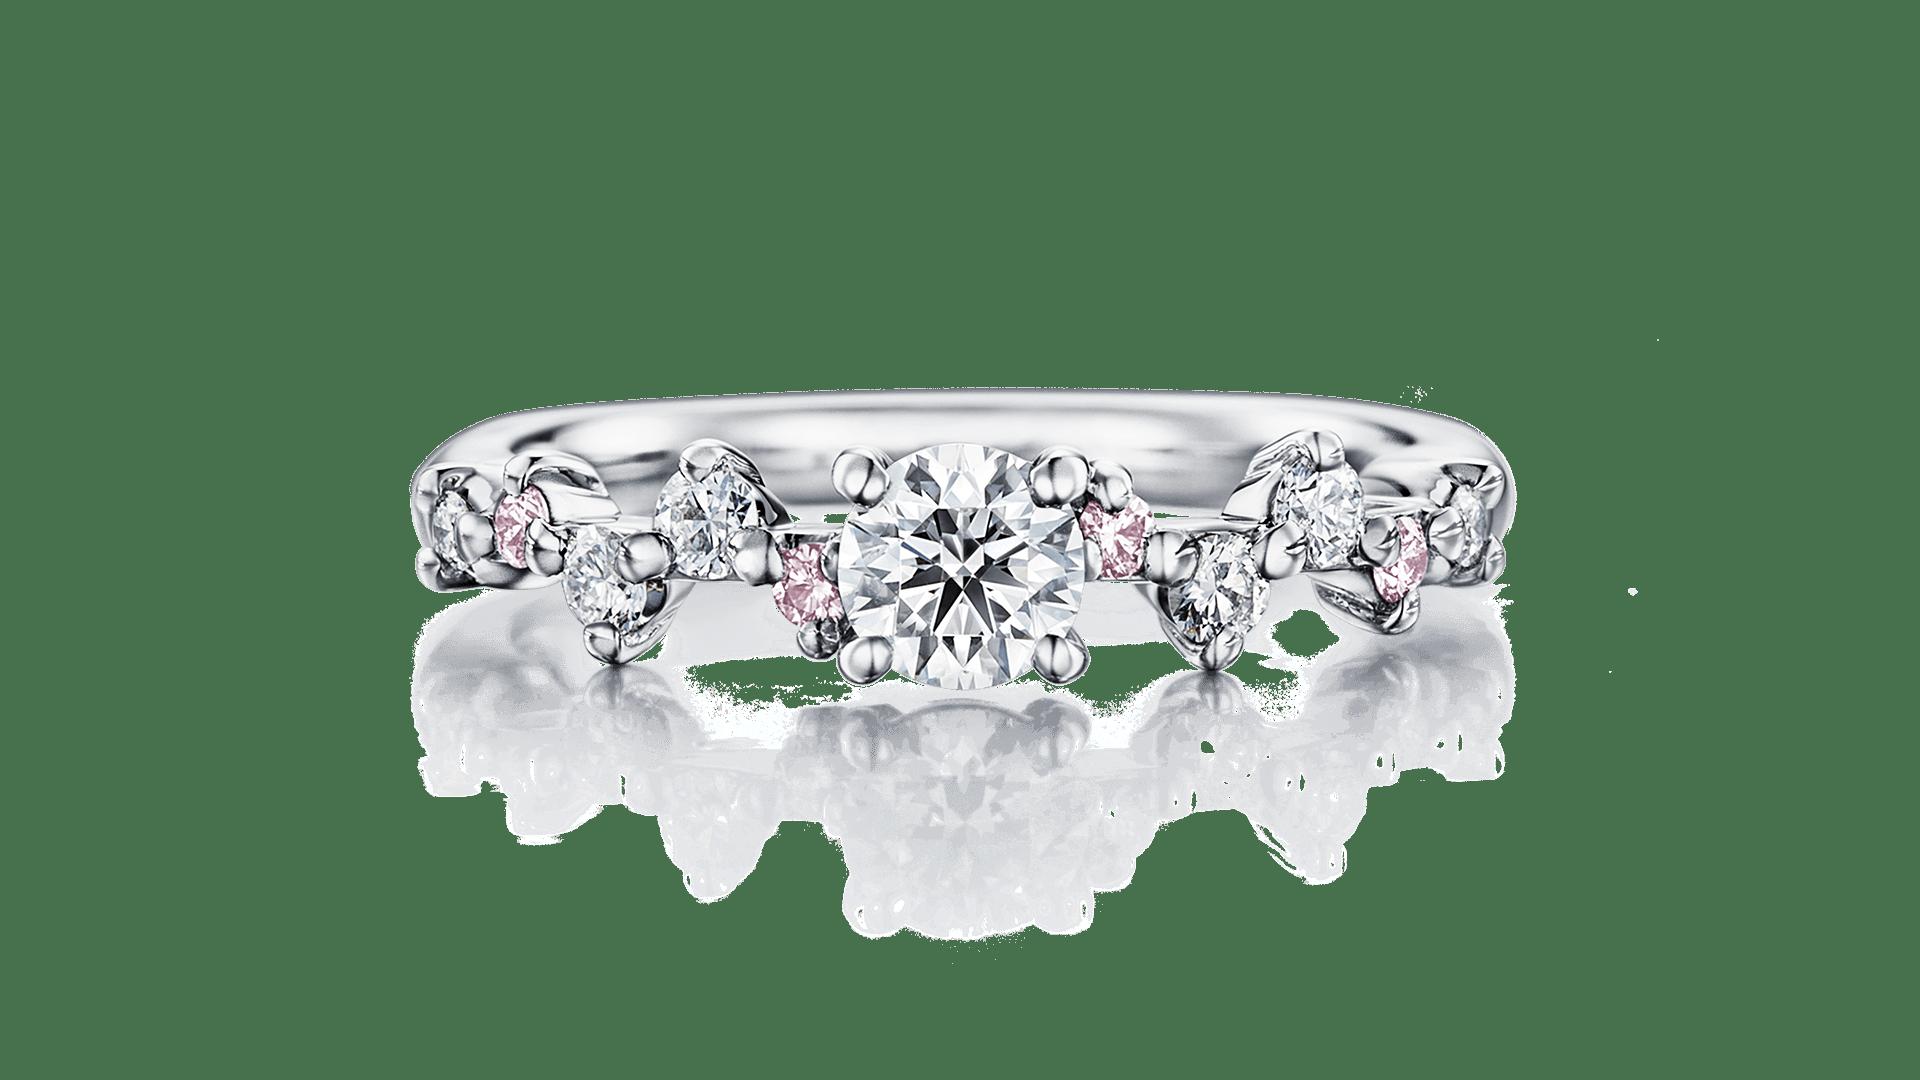 aries アリエス | 婚約指輪サムネイル 1